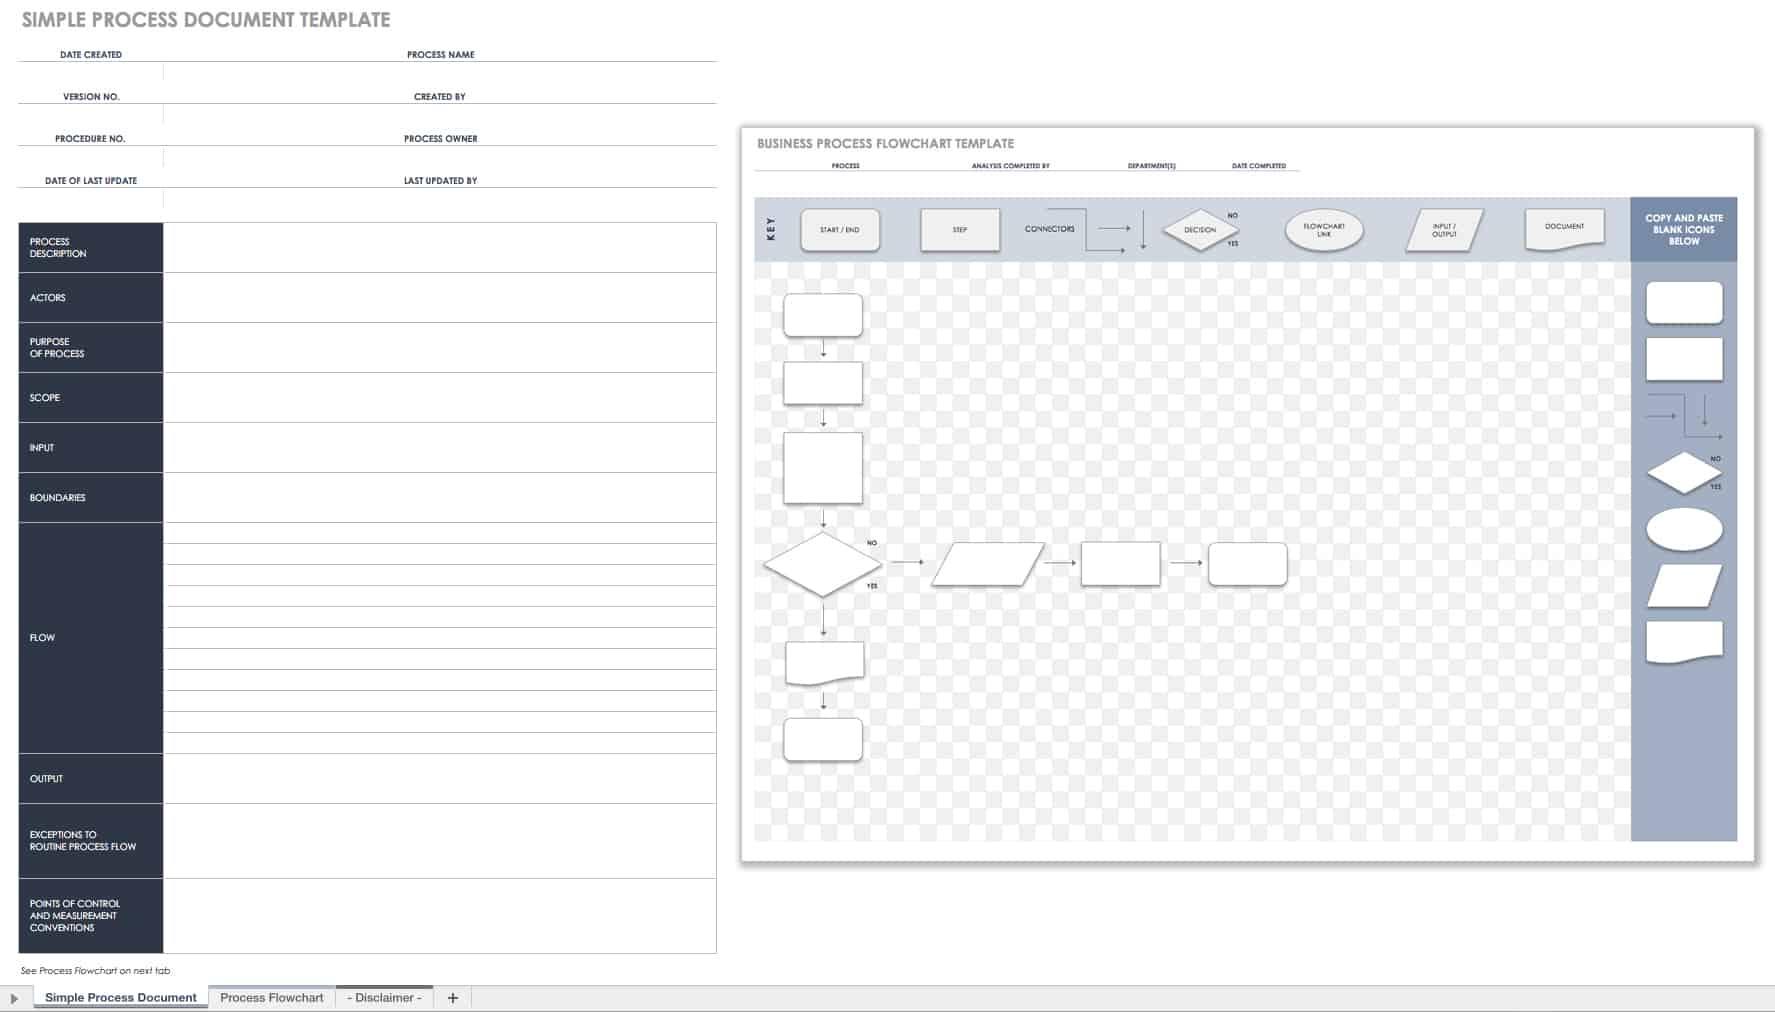 process diagram template excel porsche 914 starter wiring chart topsimages